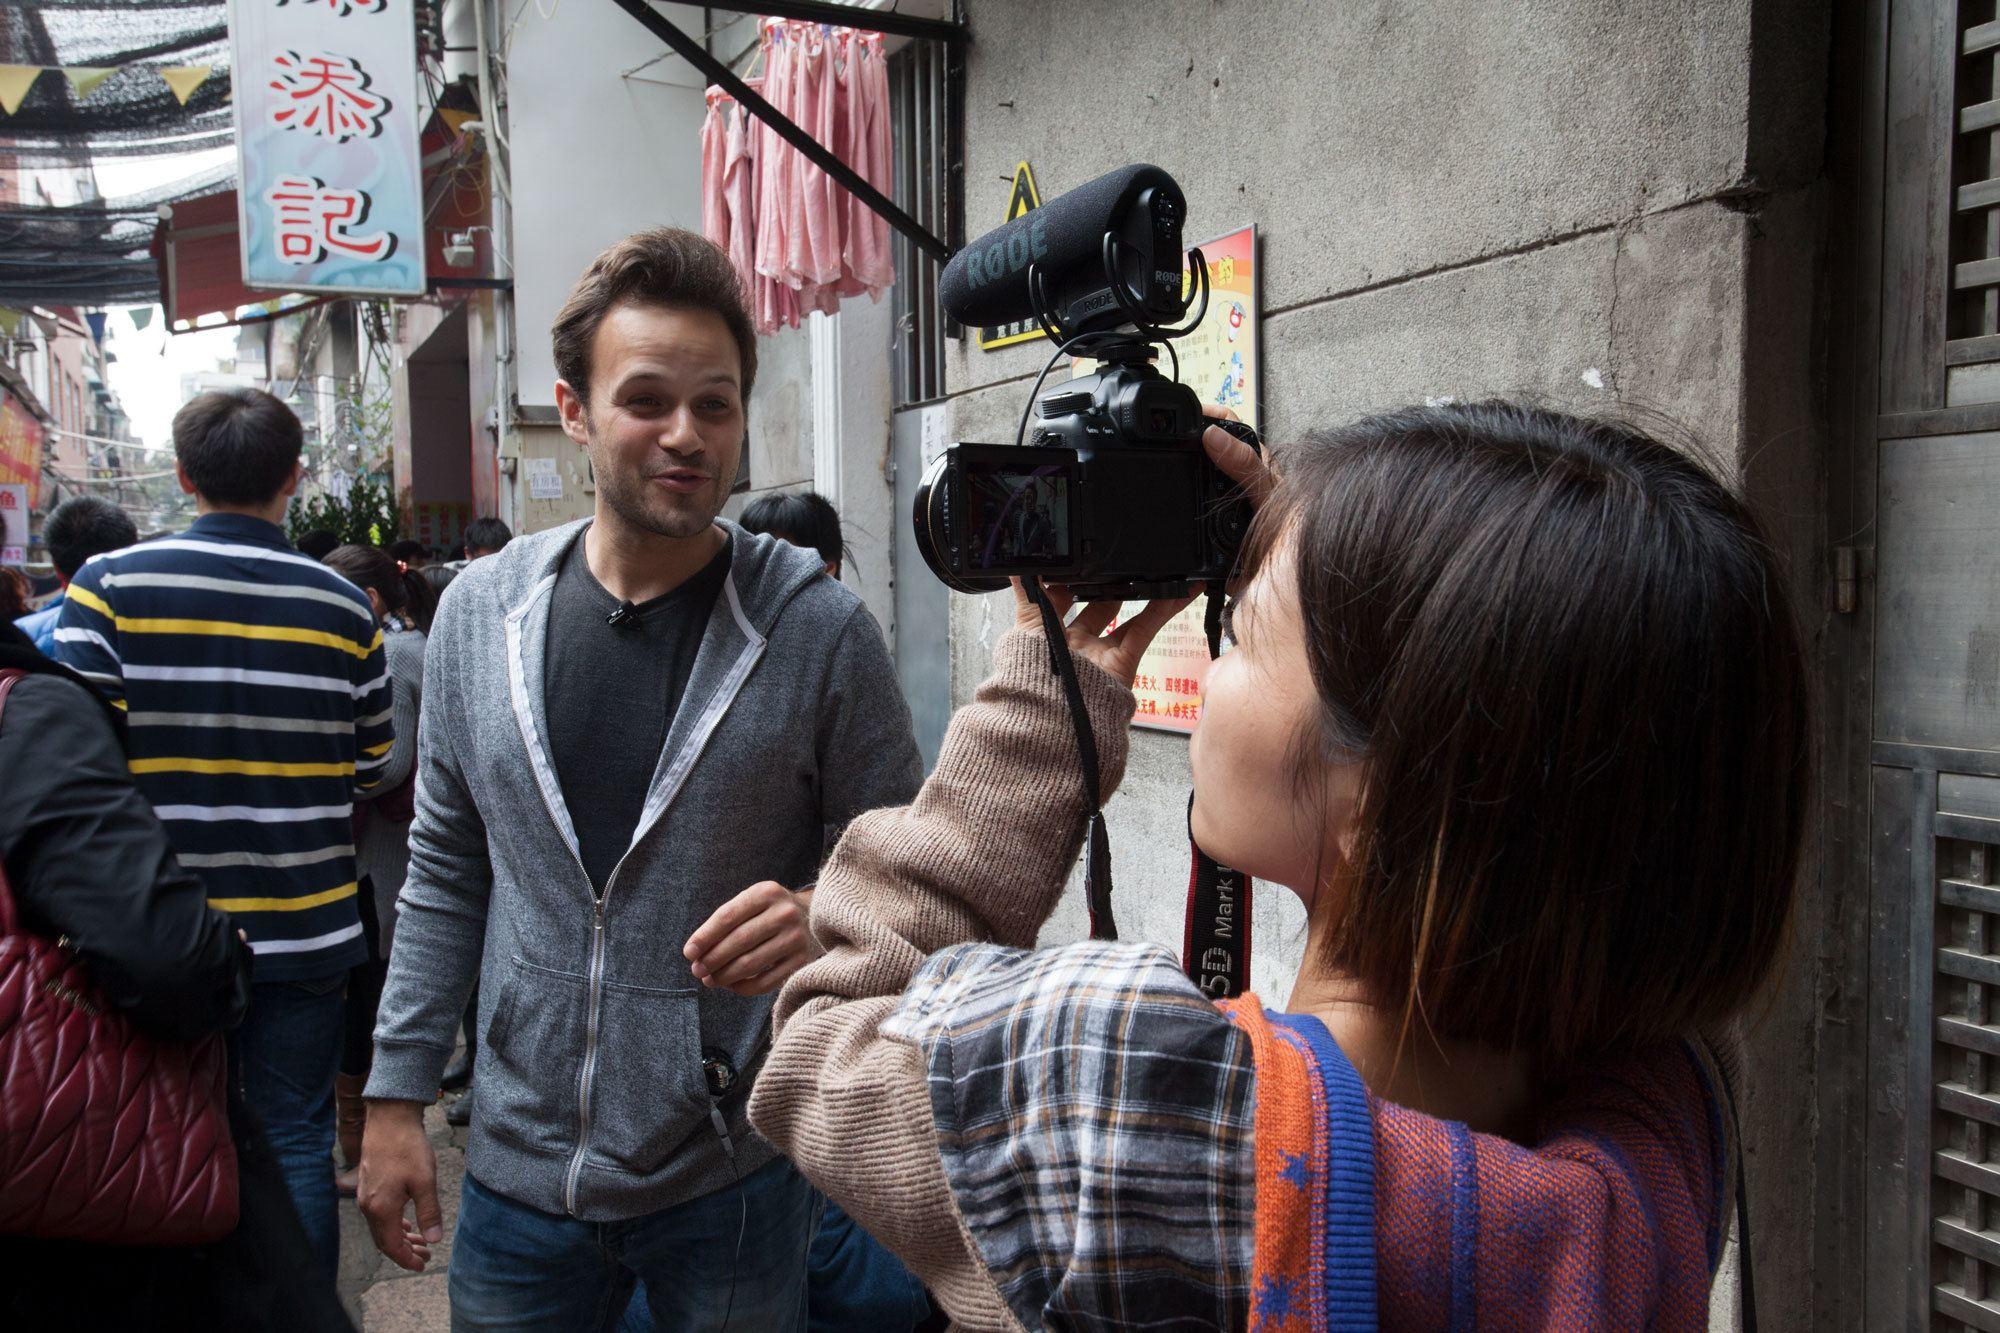 Filming the food ranger in Guangzhou, China